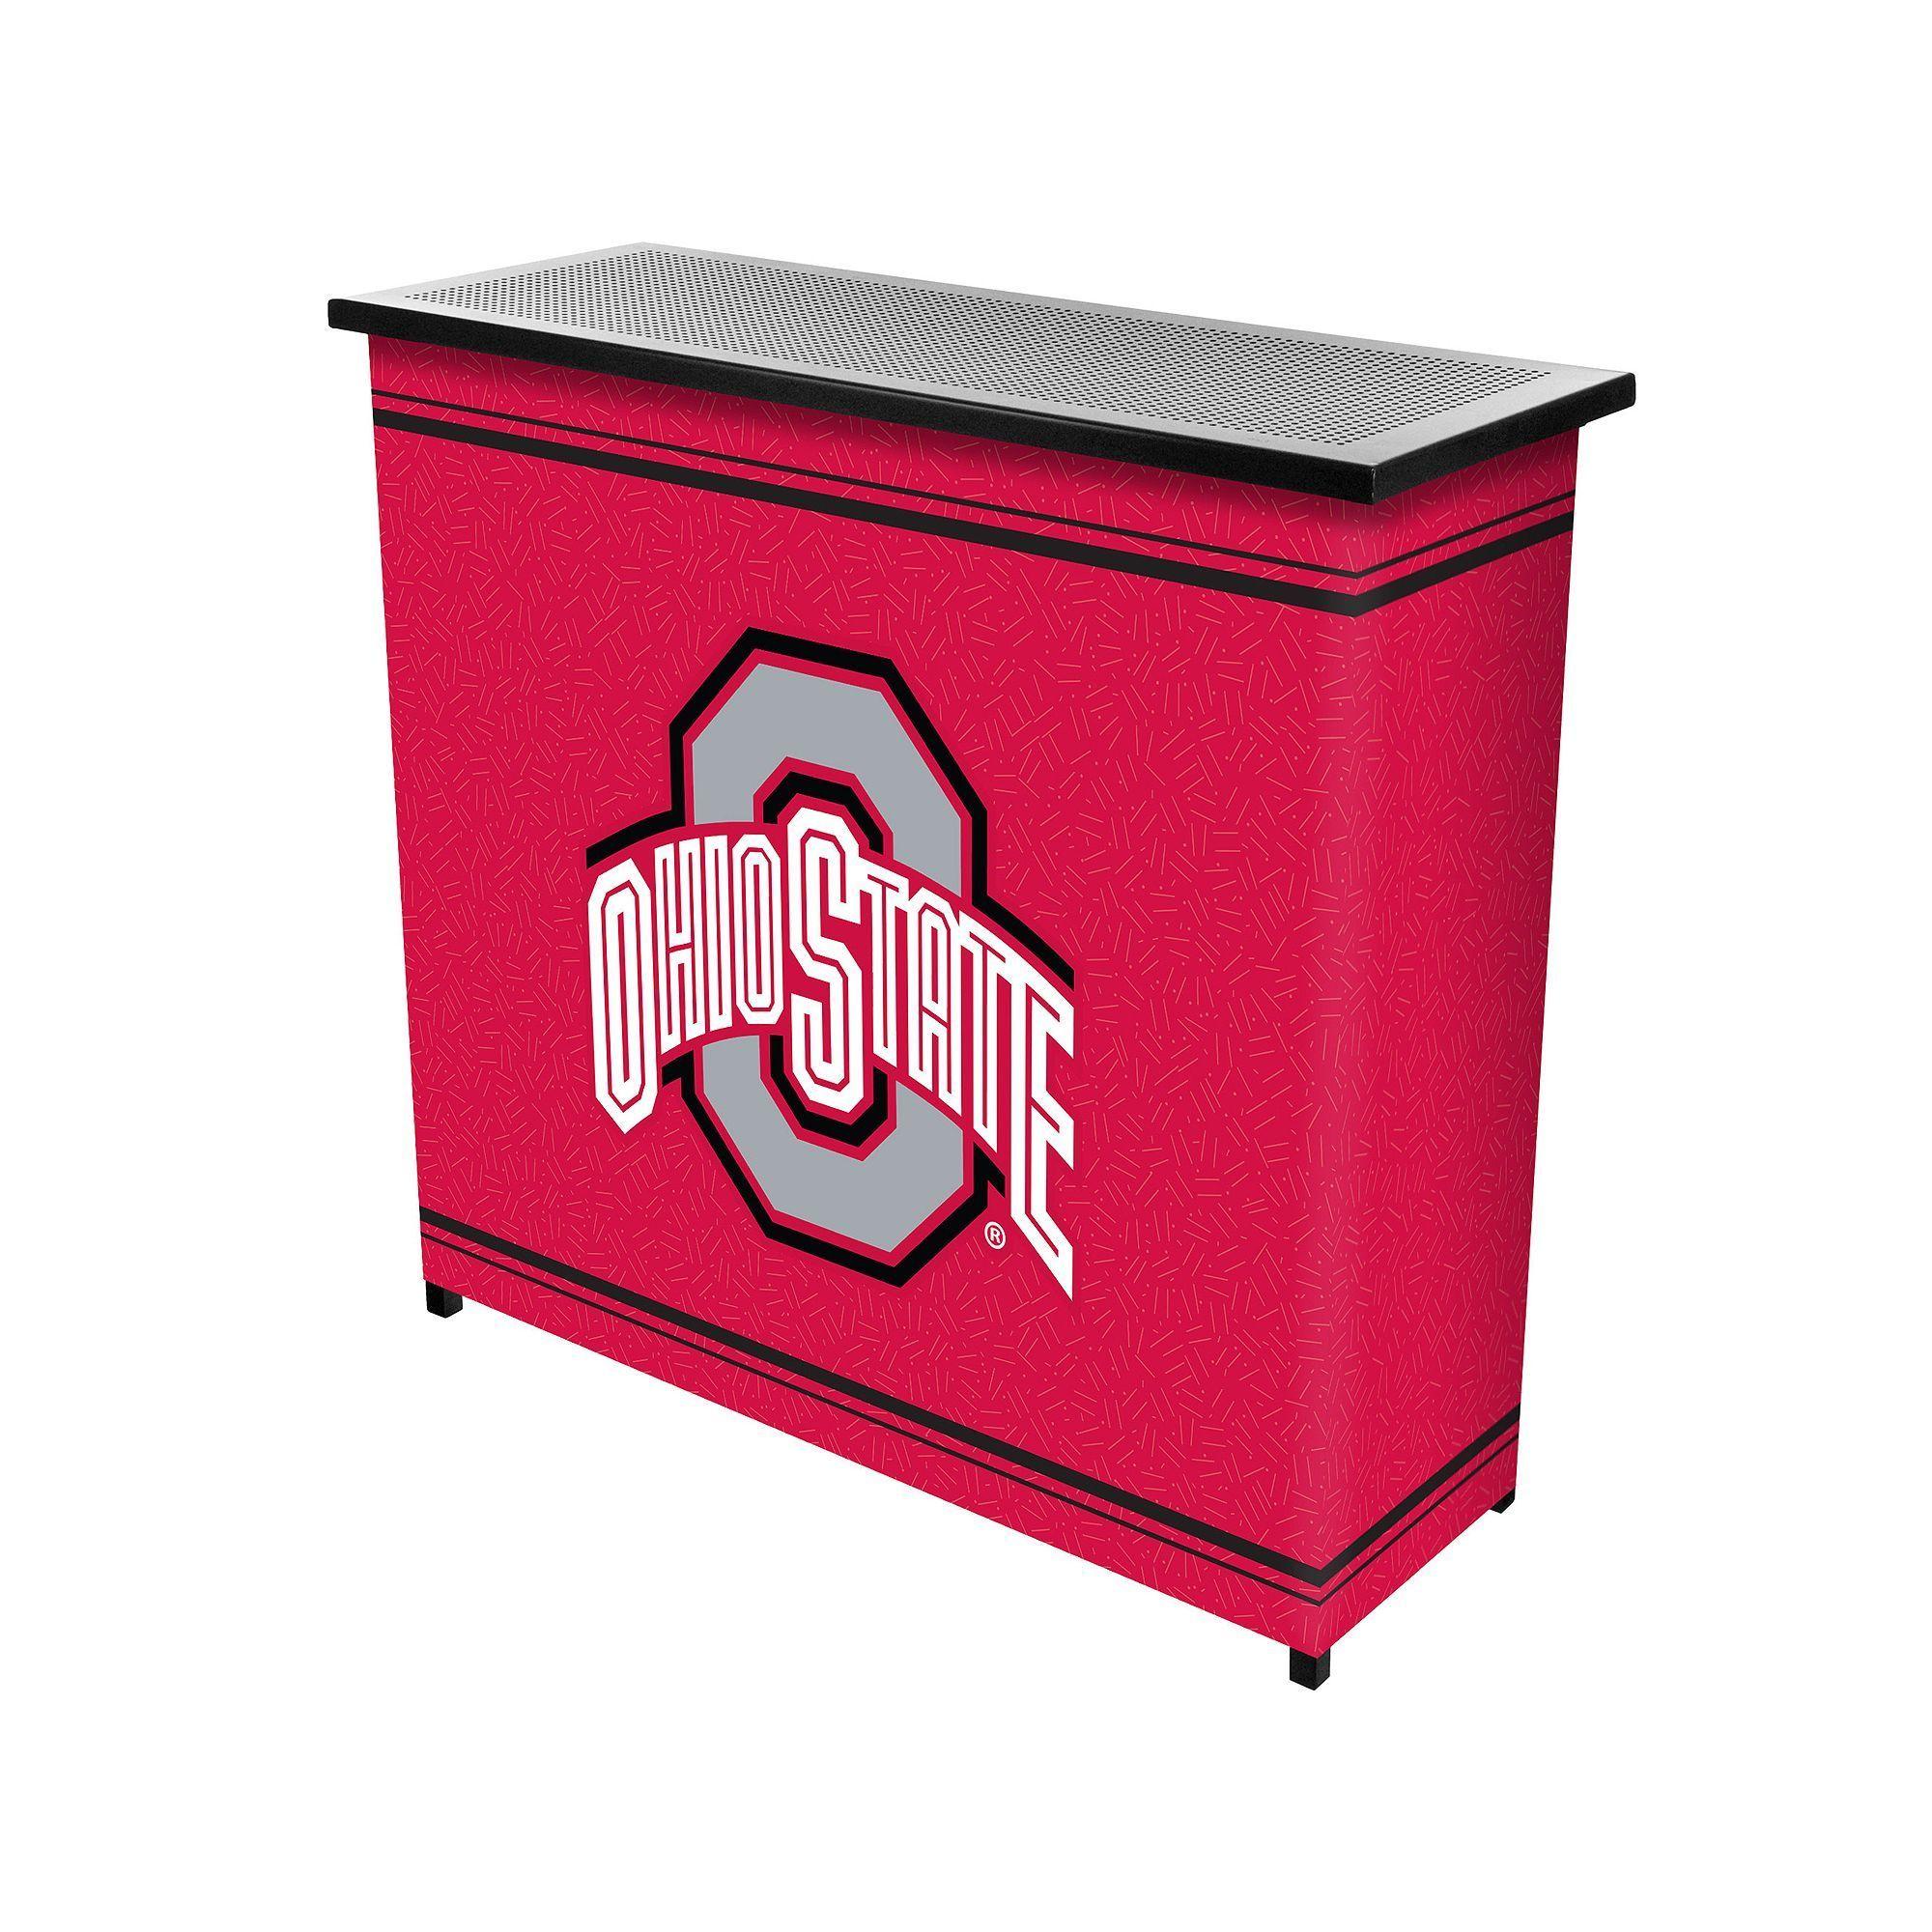 Ohio State Buckeyes 2Shelf Portable Bar with Case